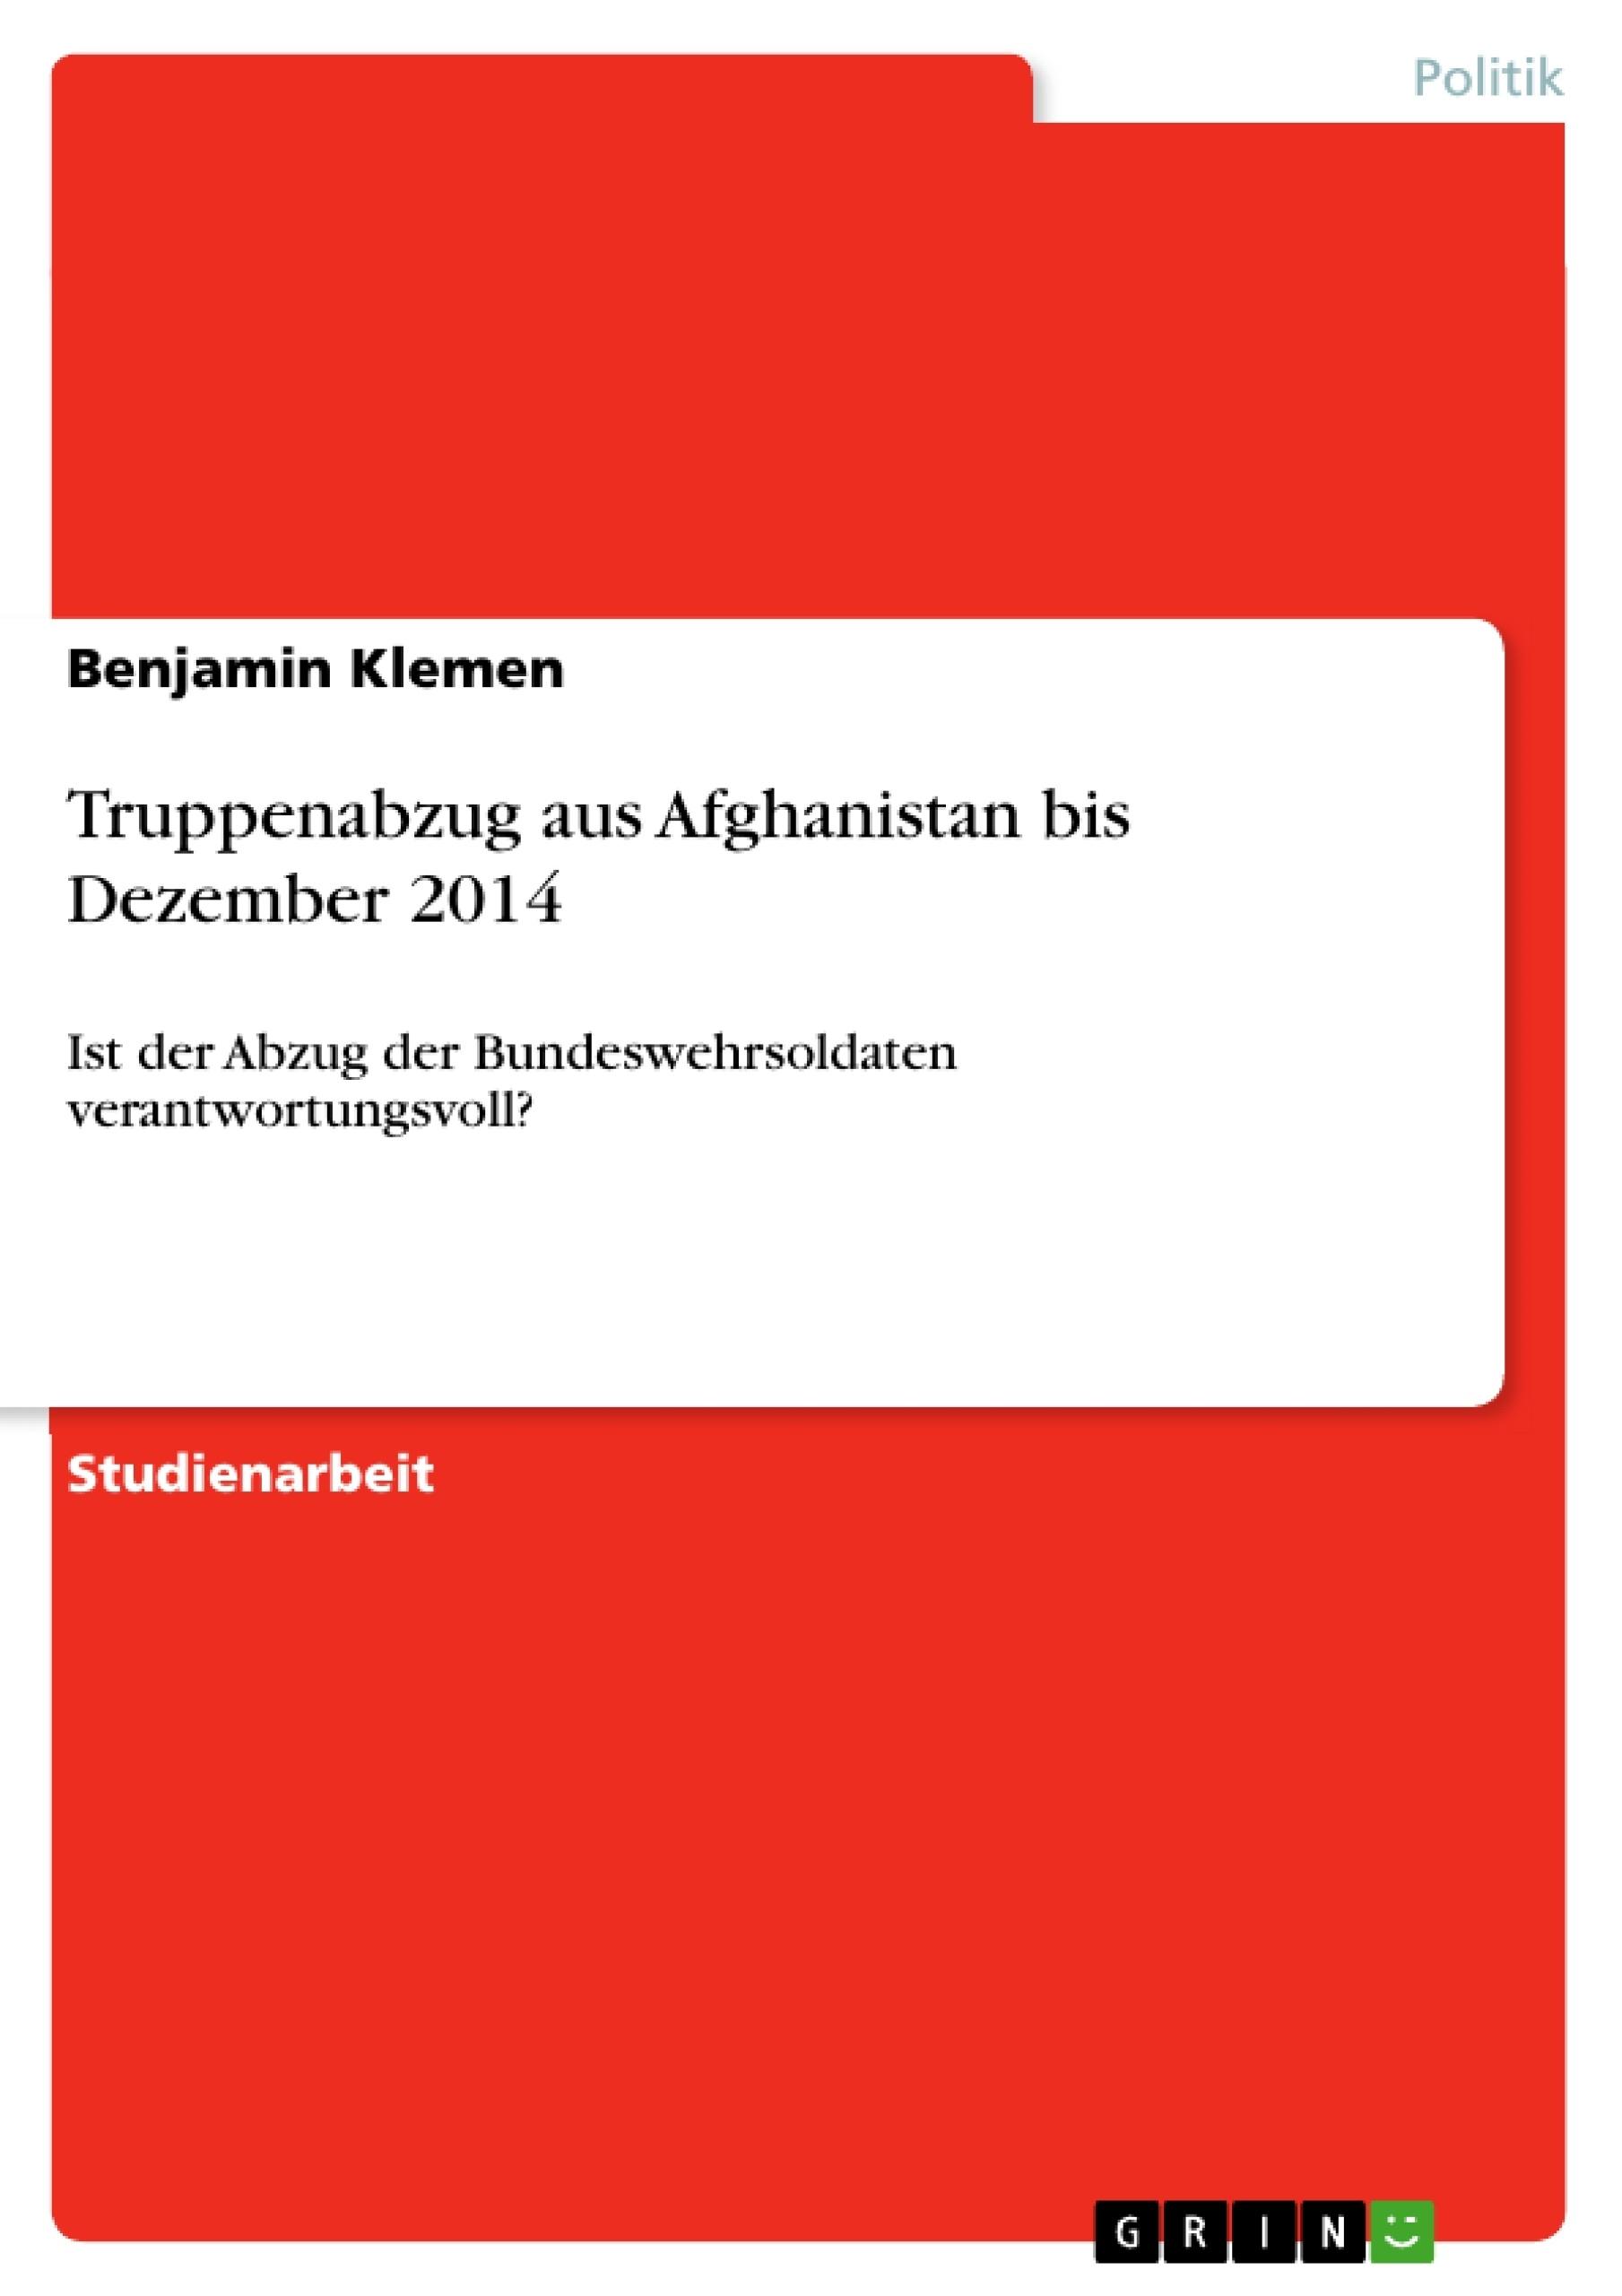 Titel: Truppenabzug aus Afghanistan bis Dezember 2014